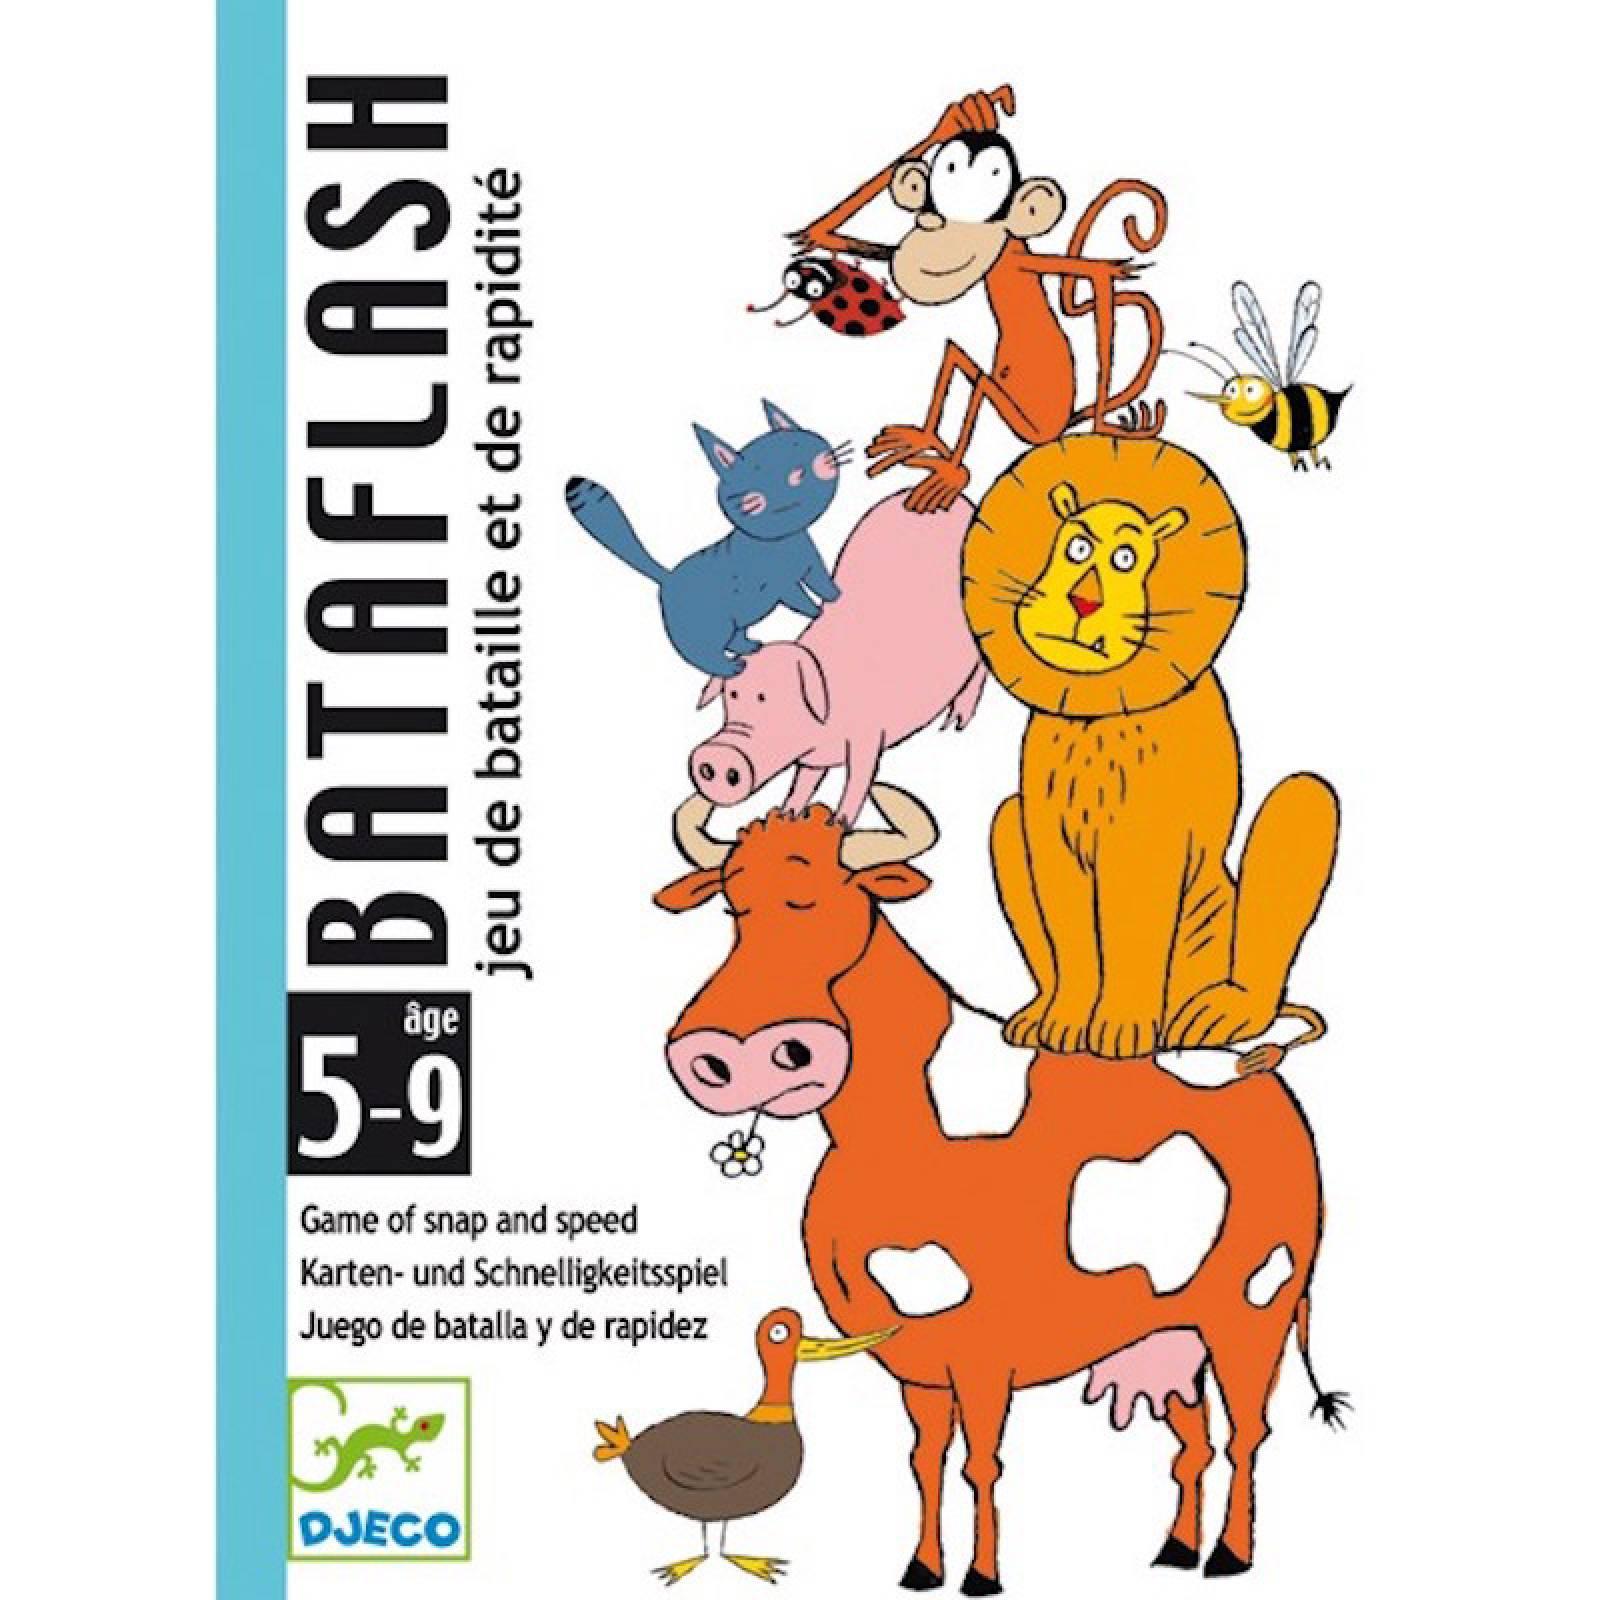 Bataflash Card Game - Observational Game of Snap 5-99yrs